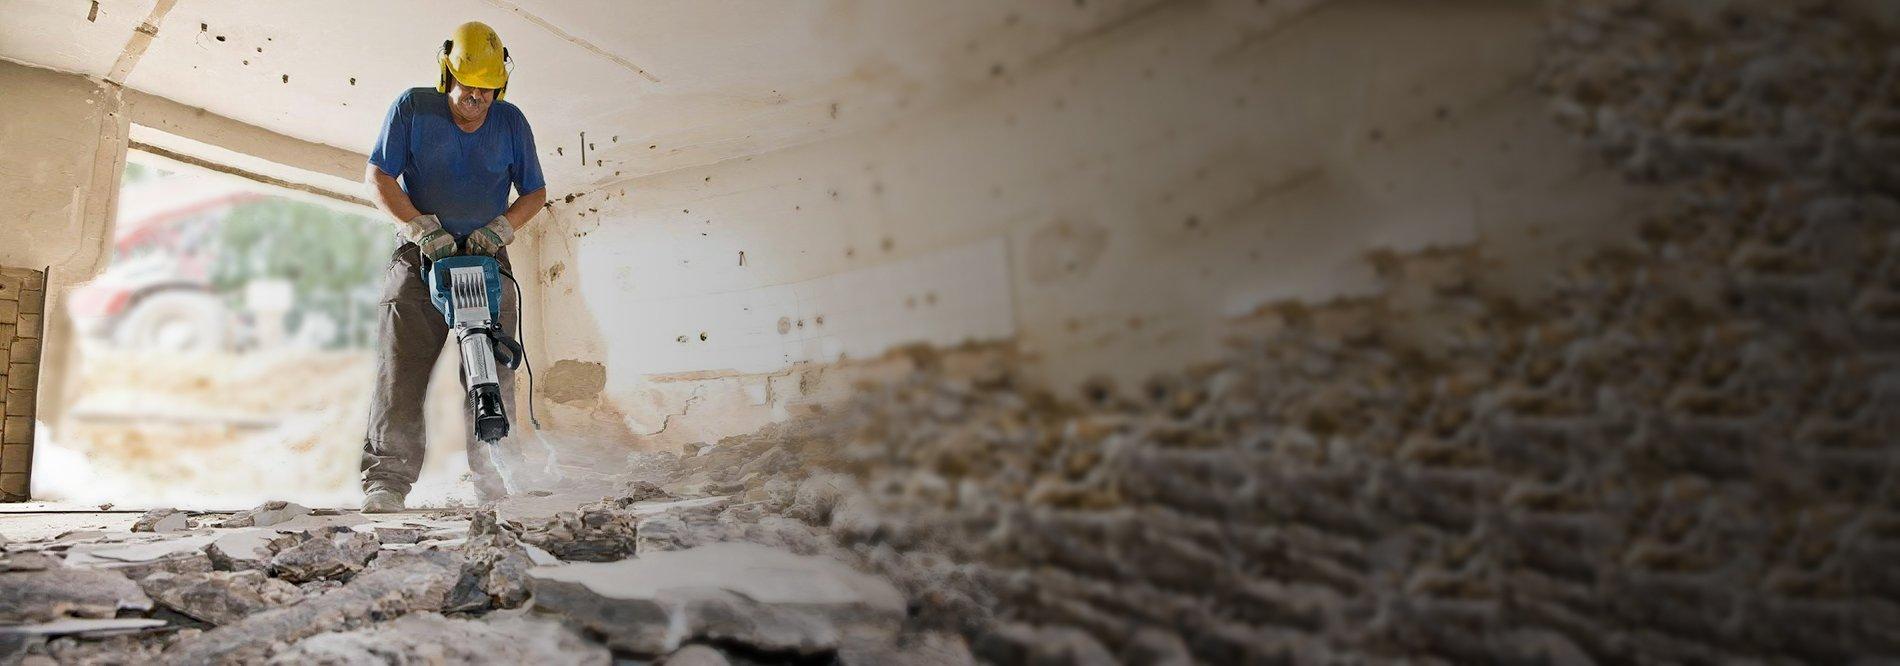 Демонтаж стен в квартираж instrument-seversk.ru